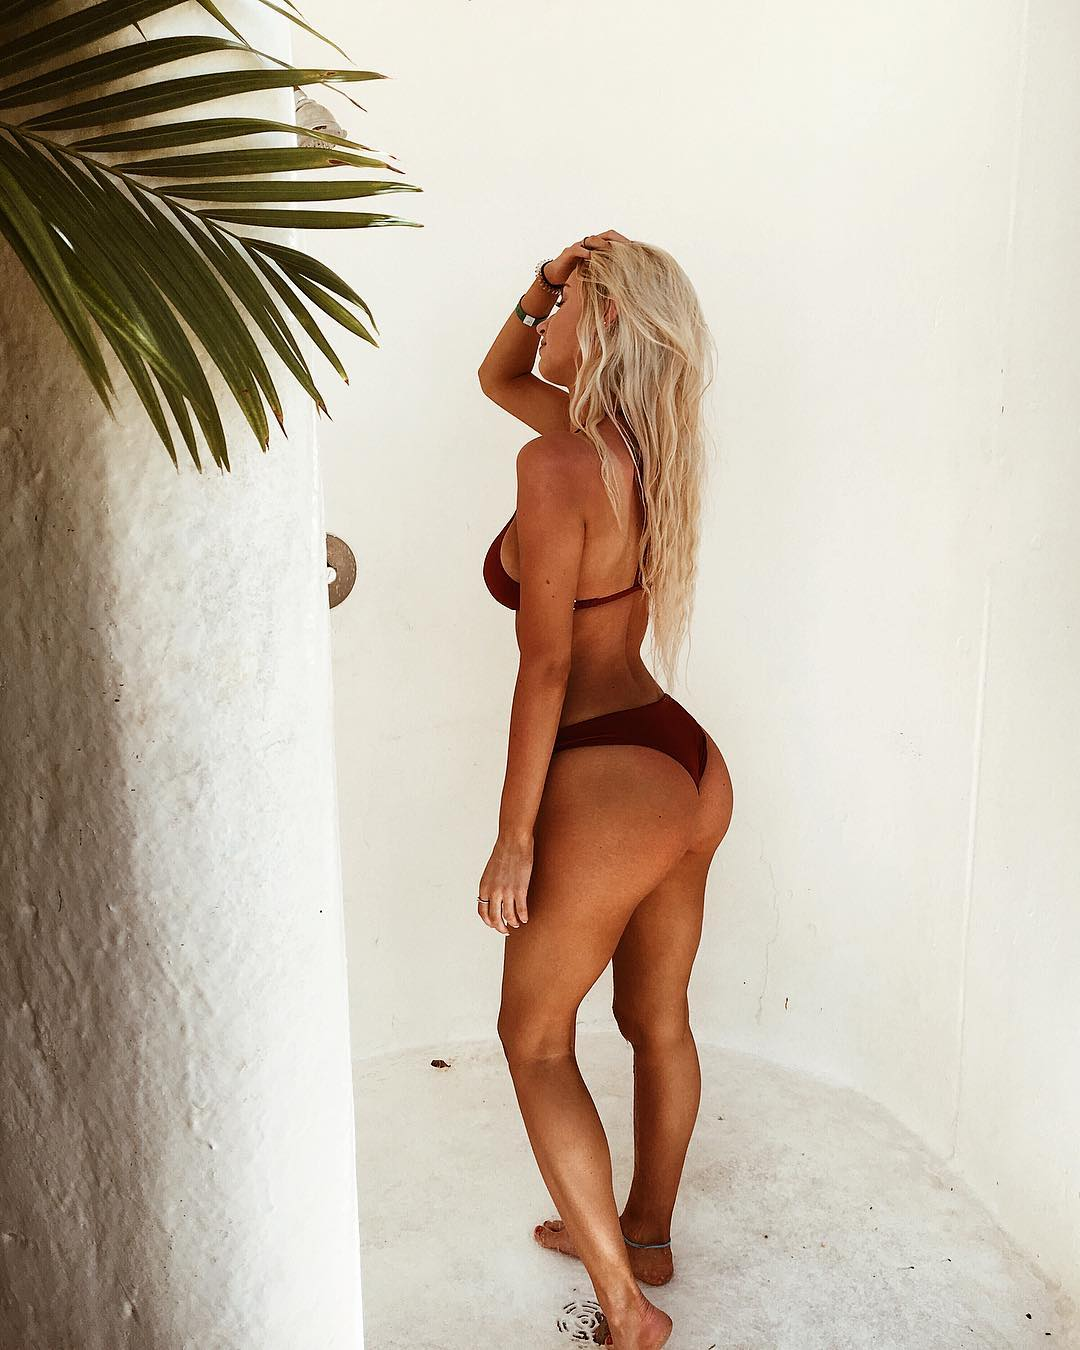 Mikayla Demaiter, a guarda-redes de hóquei no gelo mais sexy do mundo